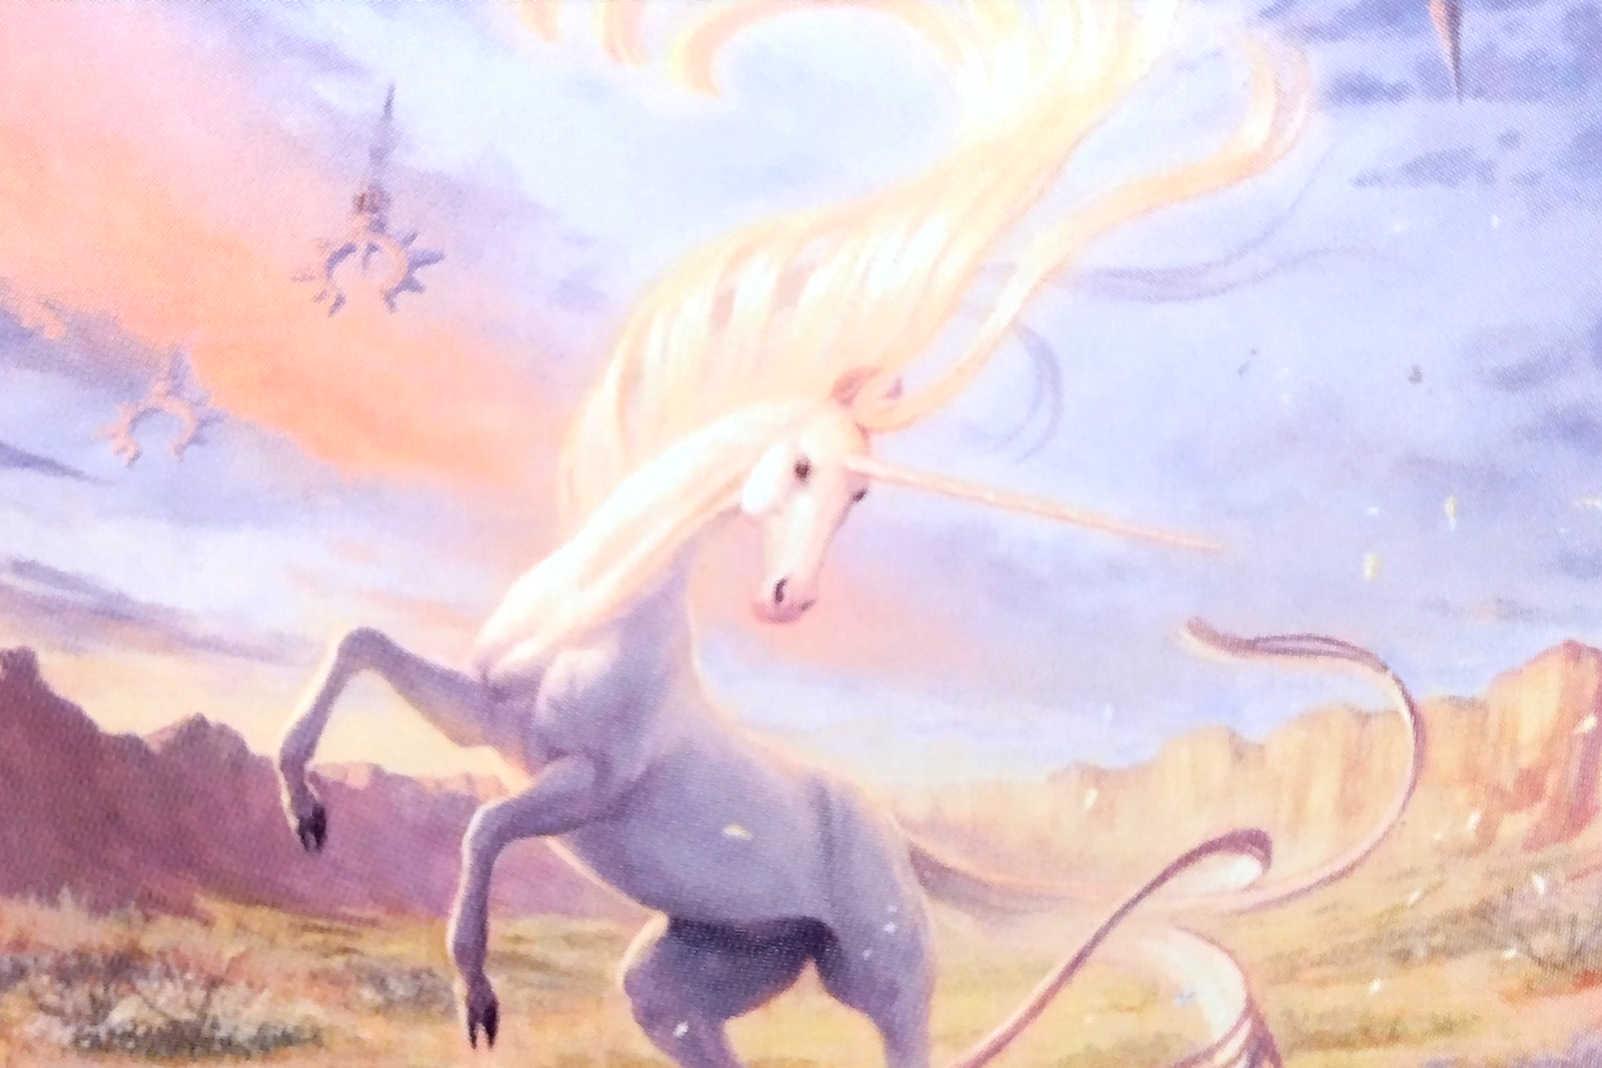 Mesa Unicorn MtG card. Image: Wizards of the Coast. Artist: Winona Nelson.